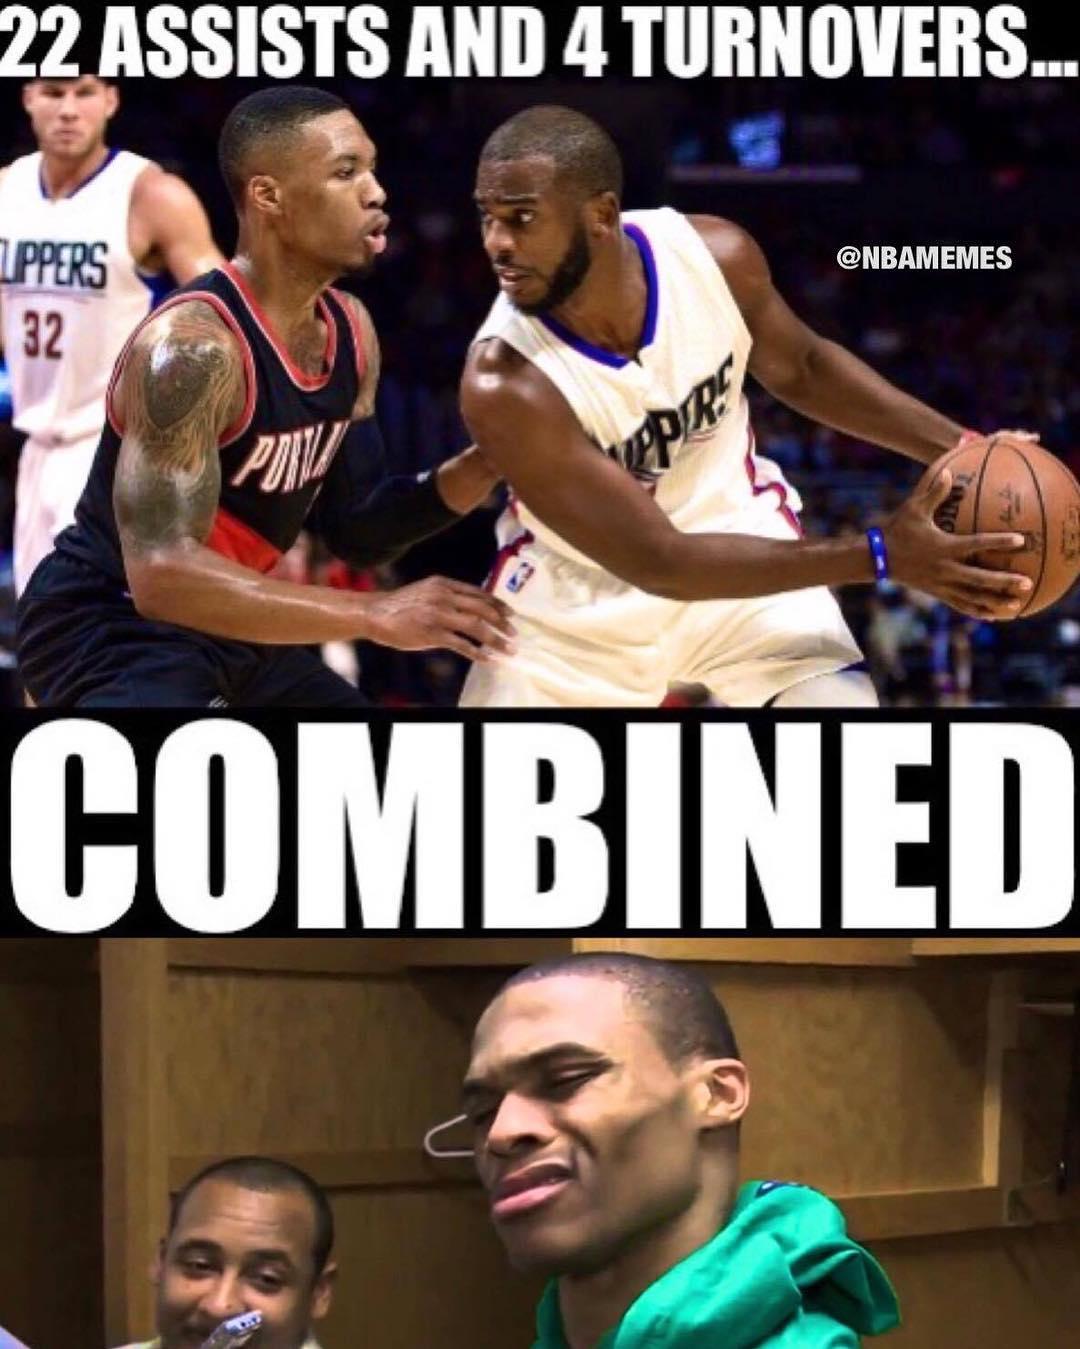 Westbrook looking at CP3 + Lillard's stat line like... ... #russell #westbrook #chris #paul #cp3 #damianlillard #dame #lillard #assist #turnover #nba #meme #memes #nbamemes